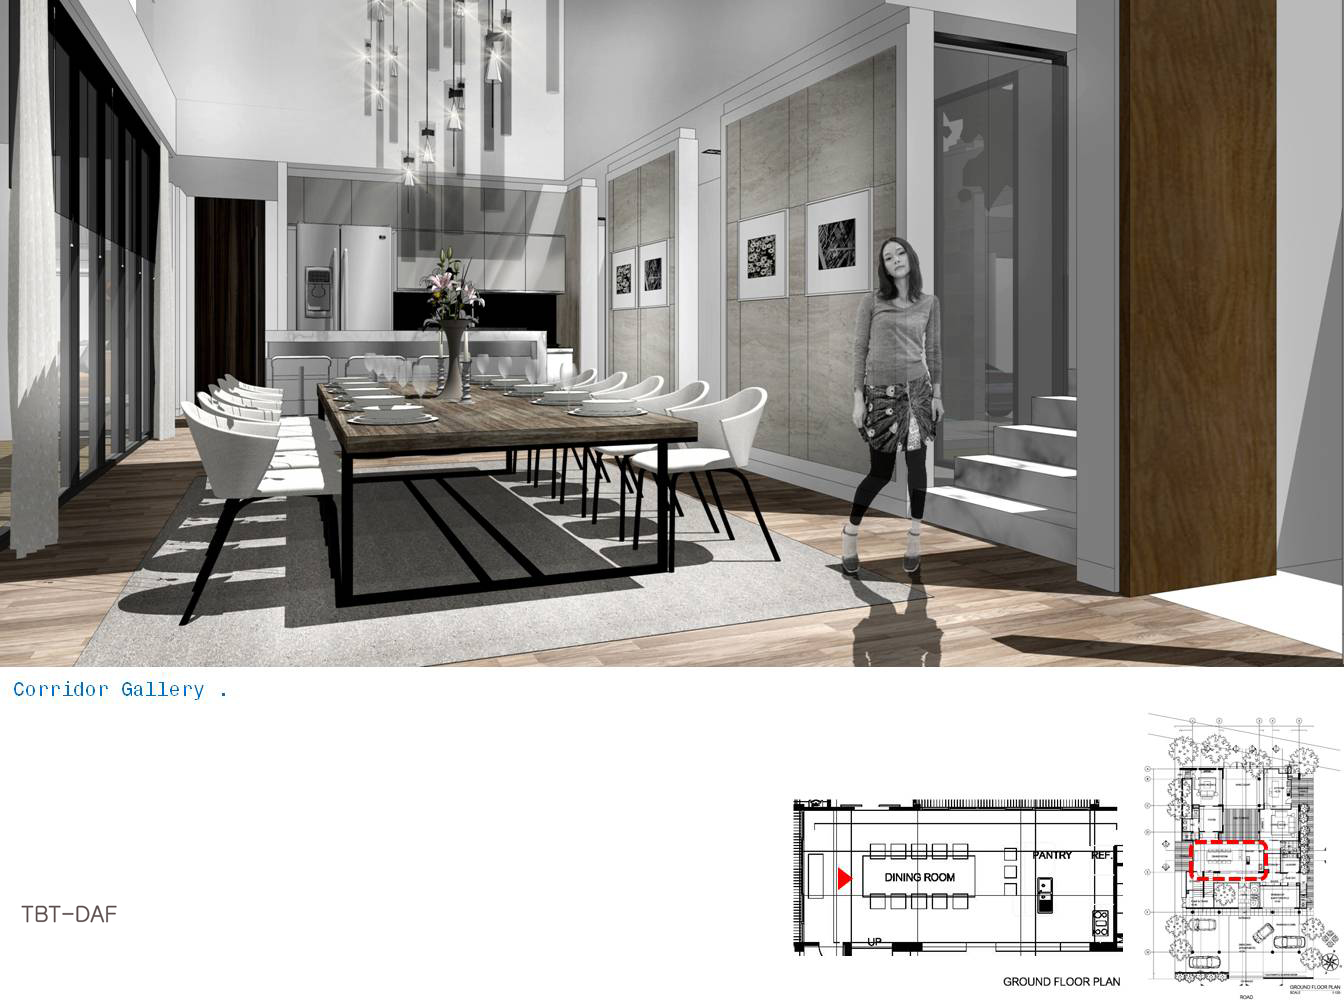 TBT-DAF interior design house robinson 4